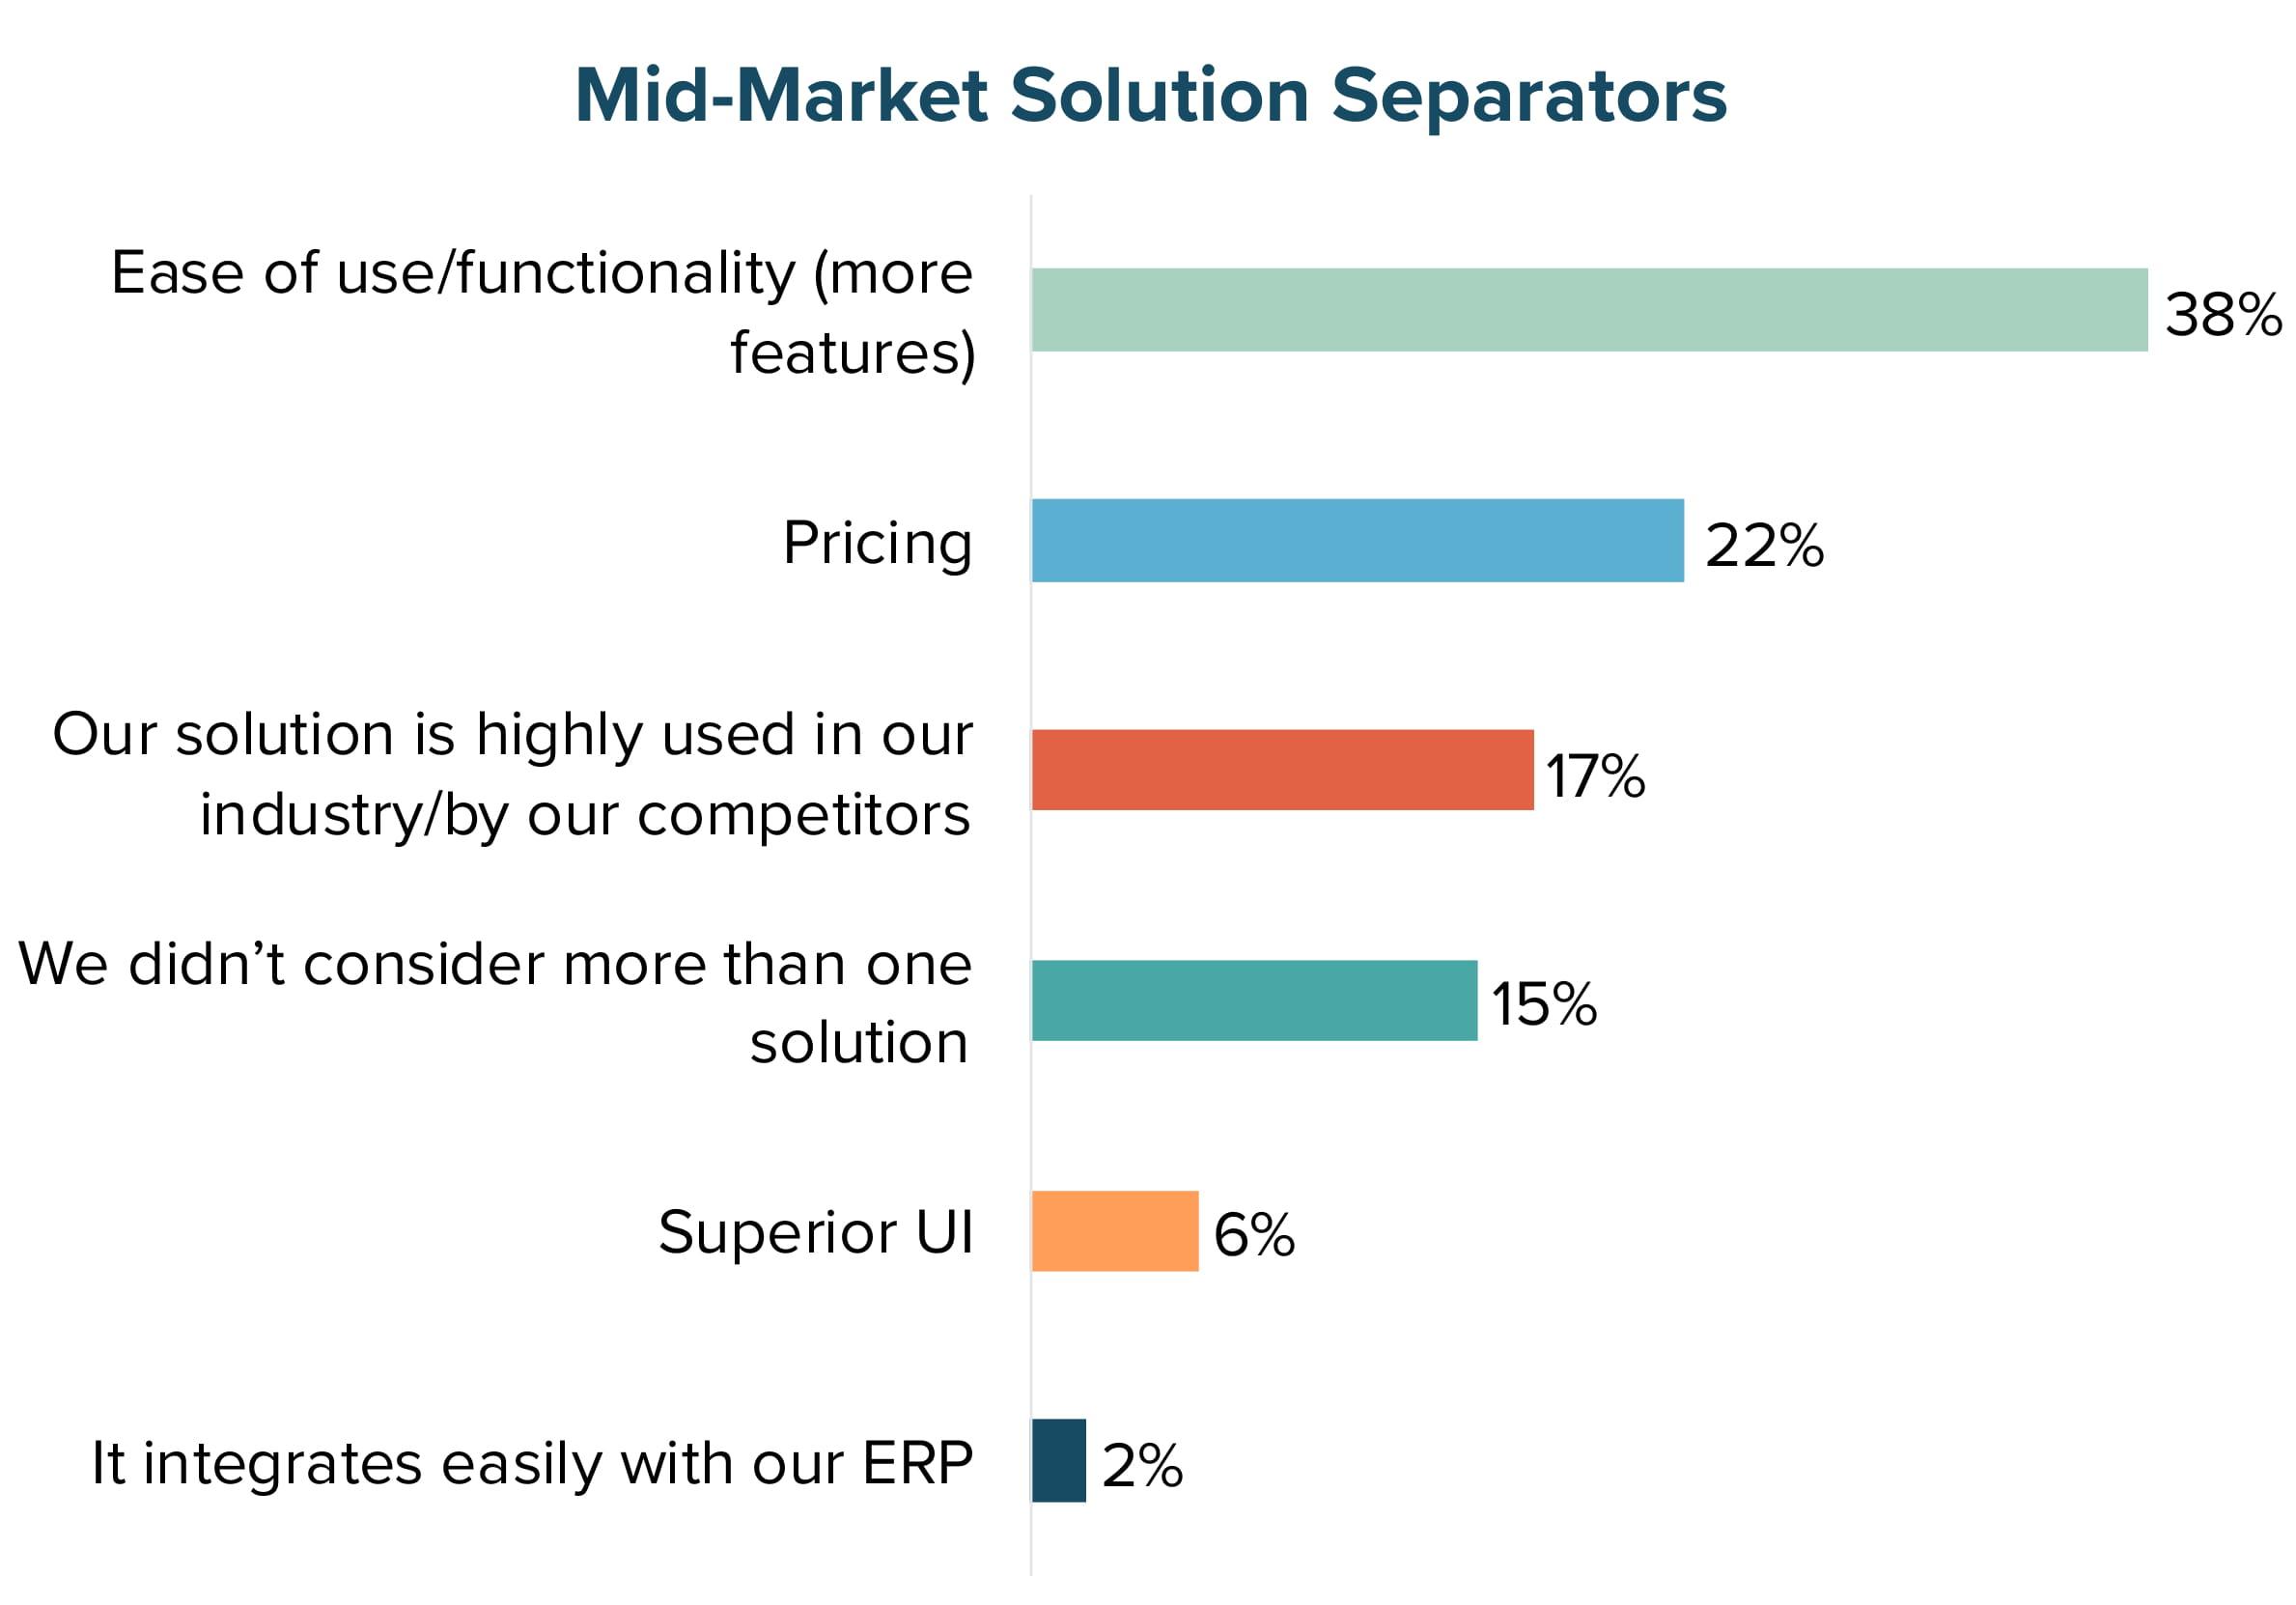 Mid-Market Solution Separators